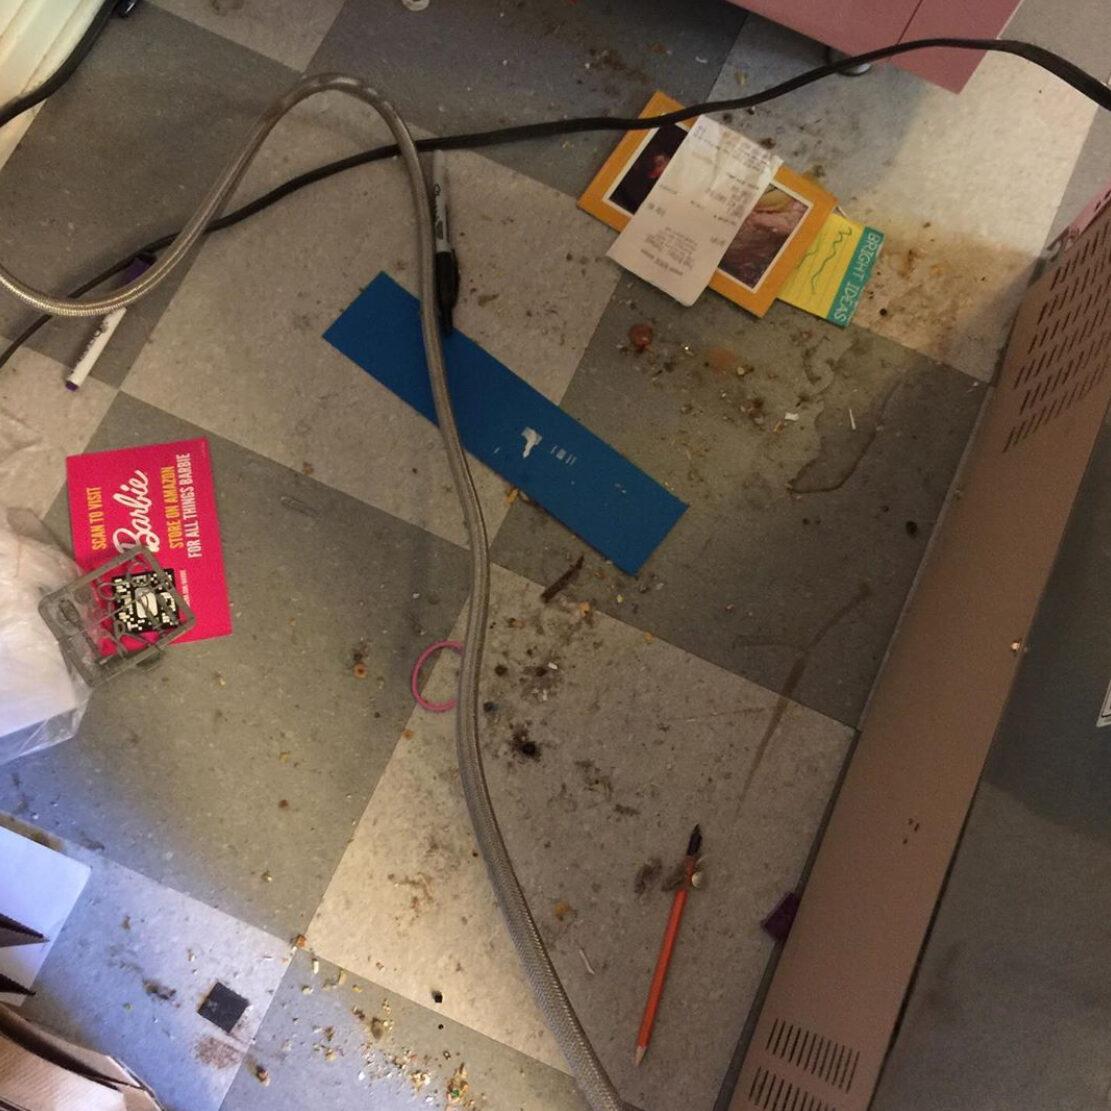 Dirt under refrigerator